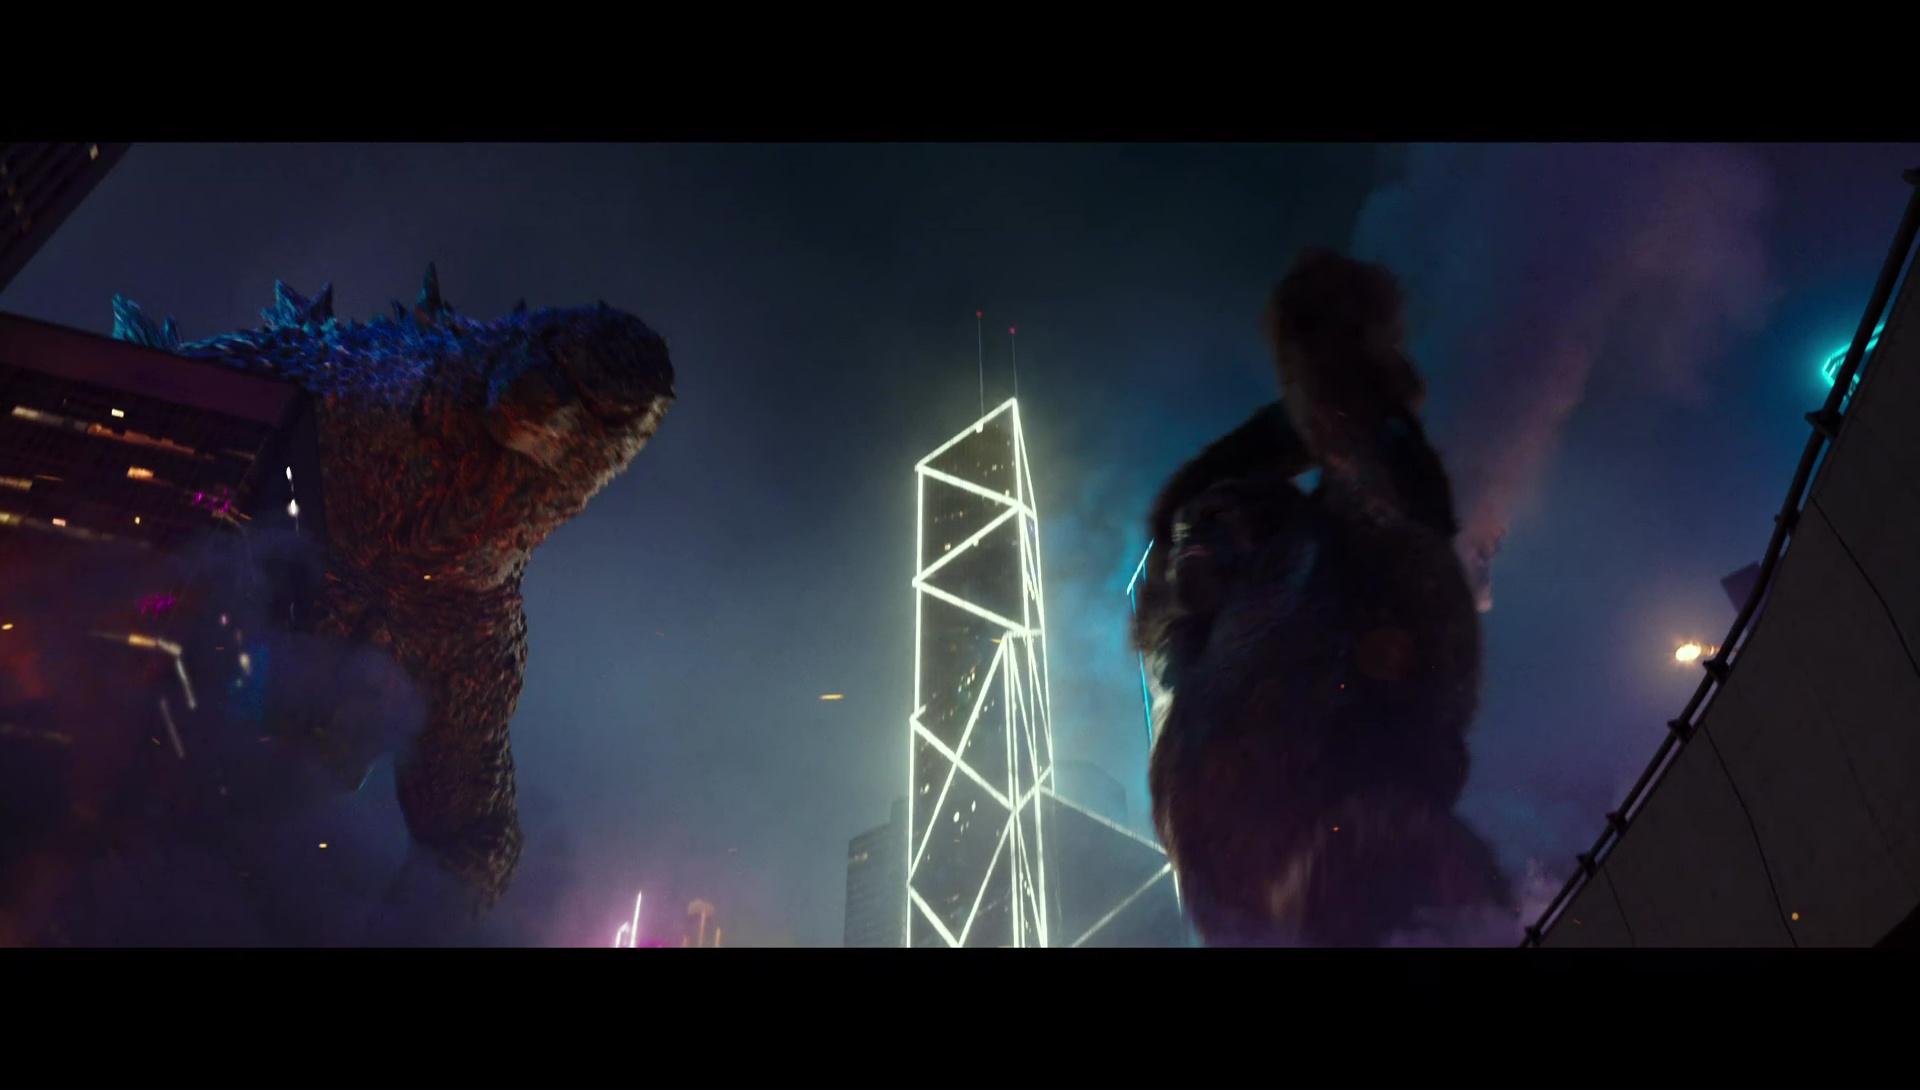 Godzilla vs. Kong: See the trailer - al.com